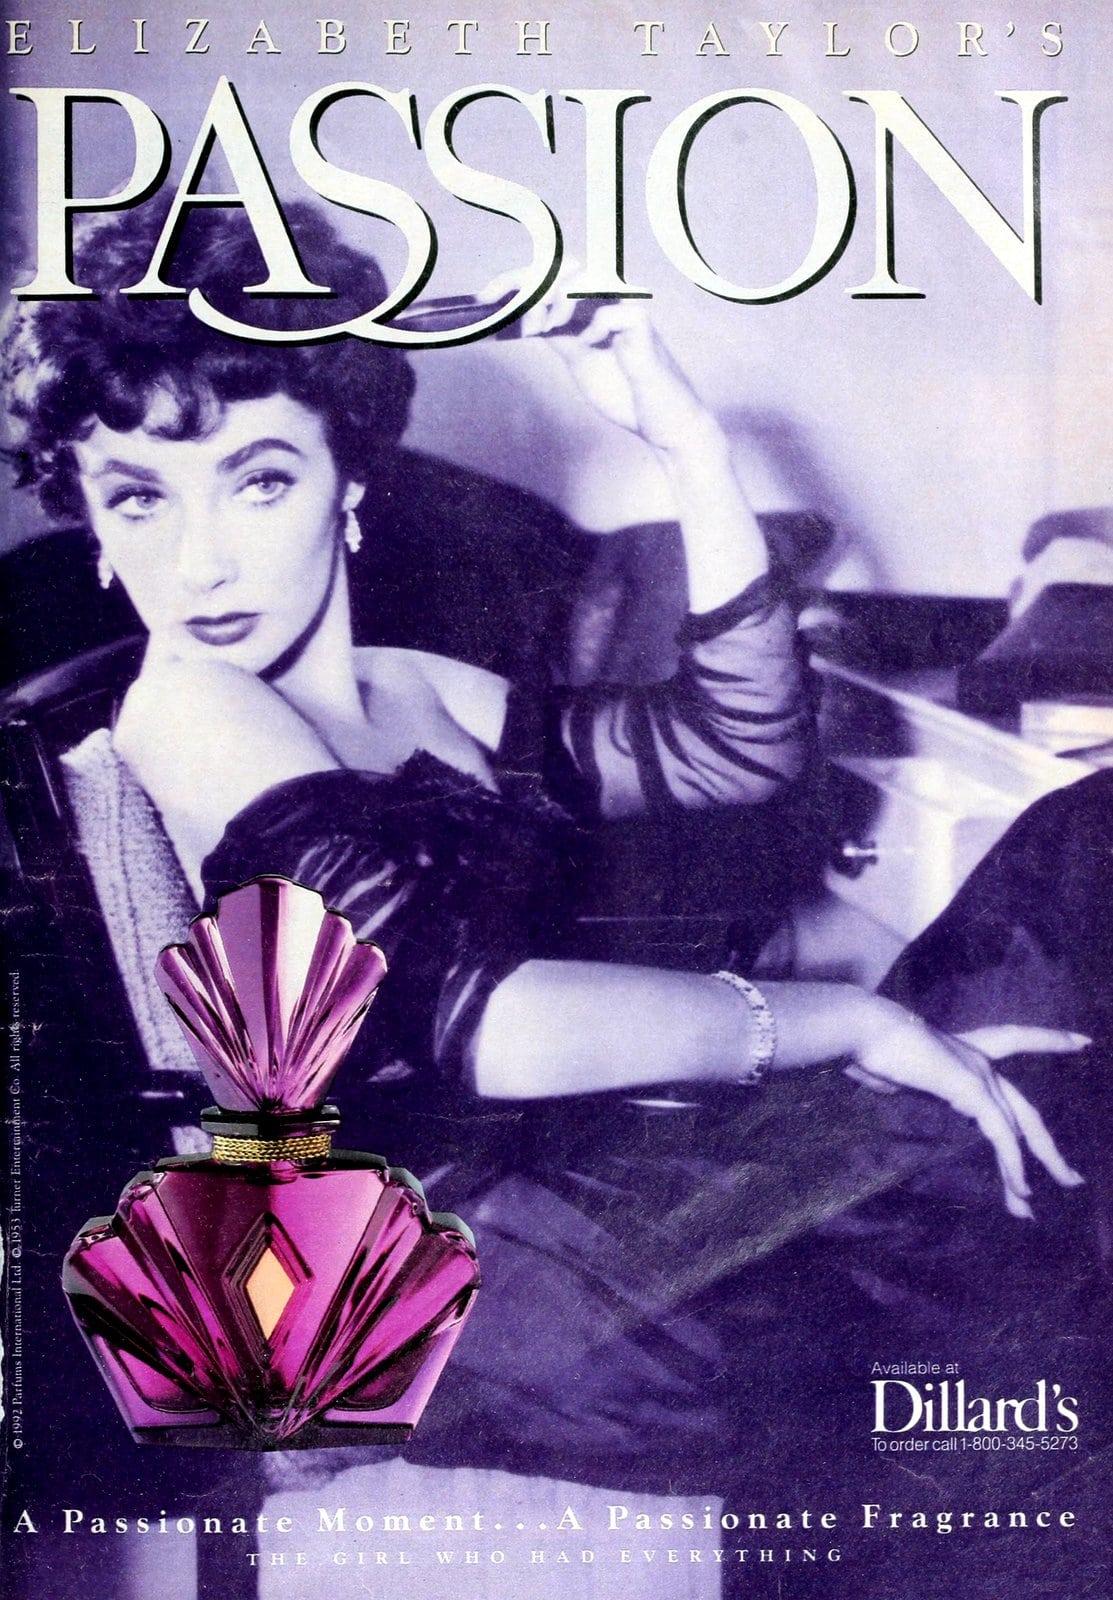 Passion from Elizabeth Taylor (1992) at ClickAmericana.com